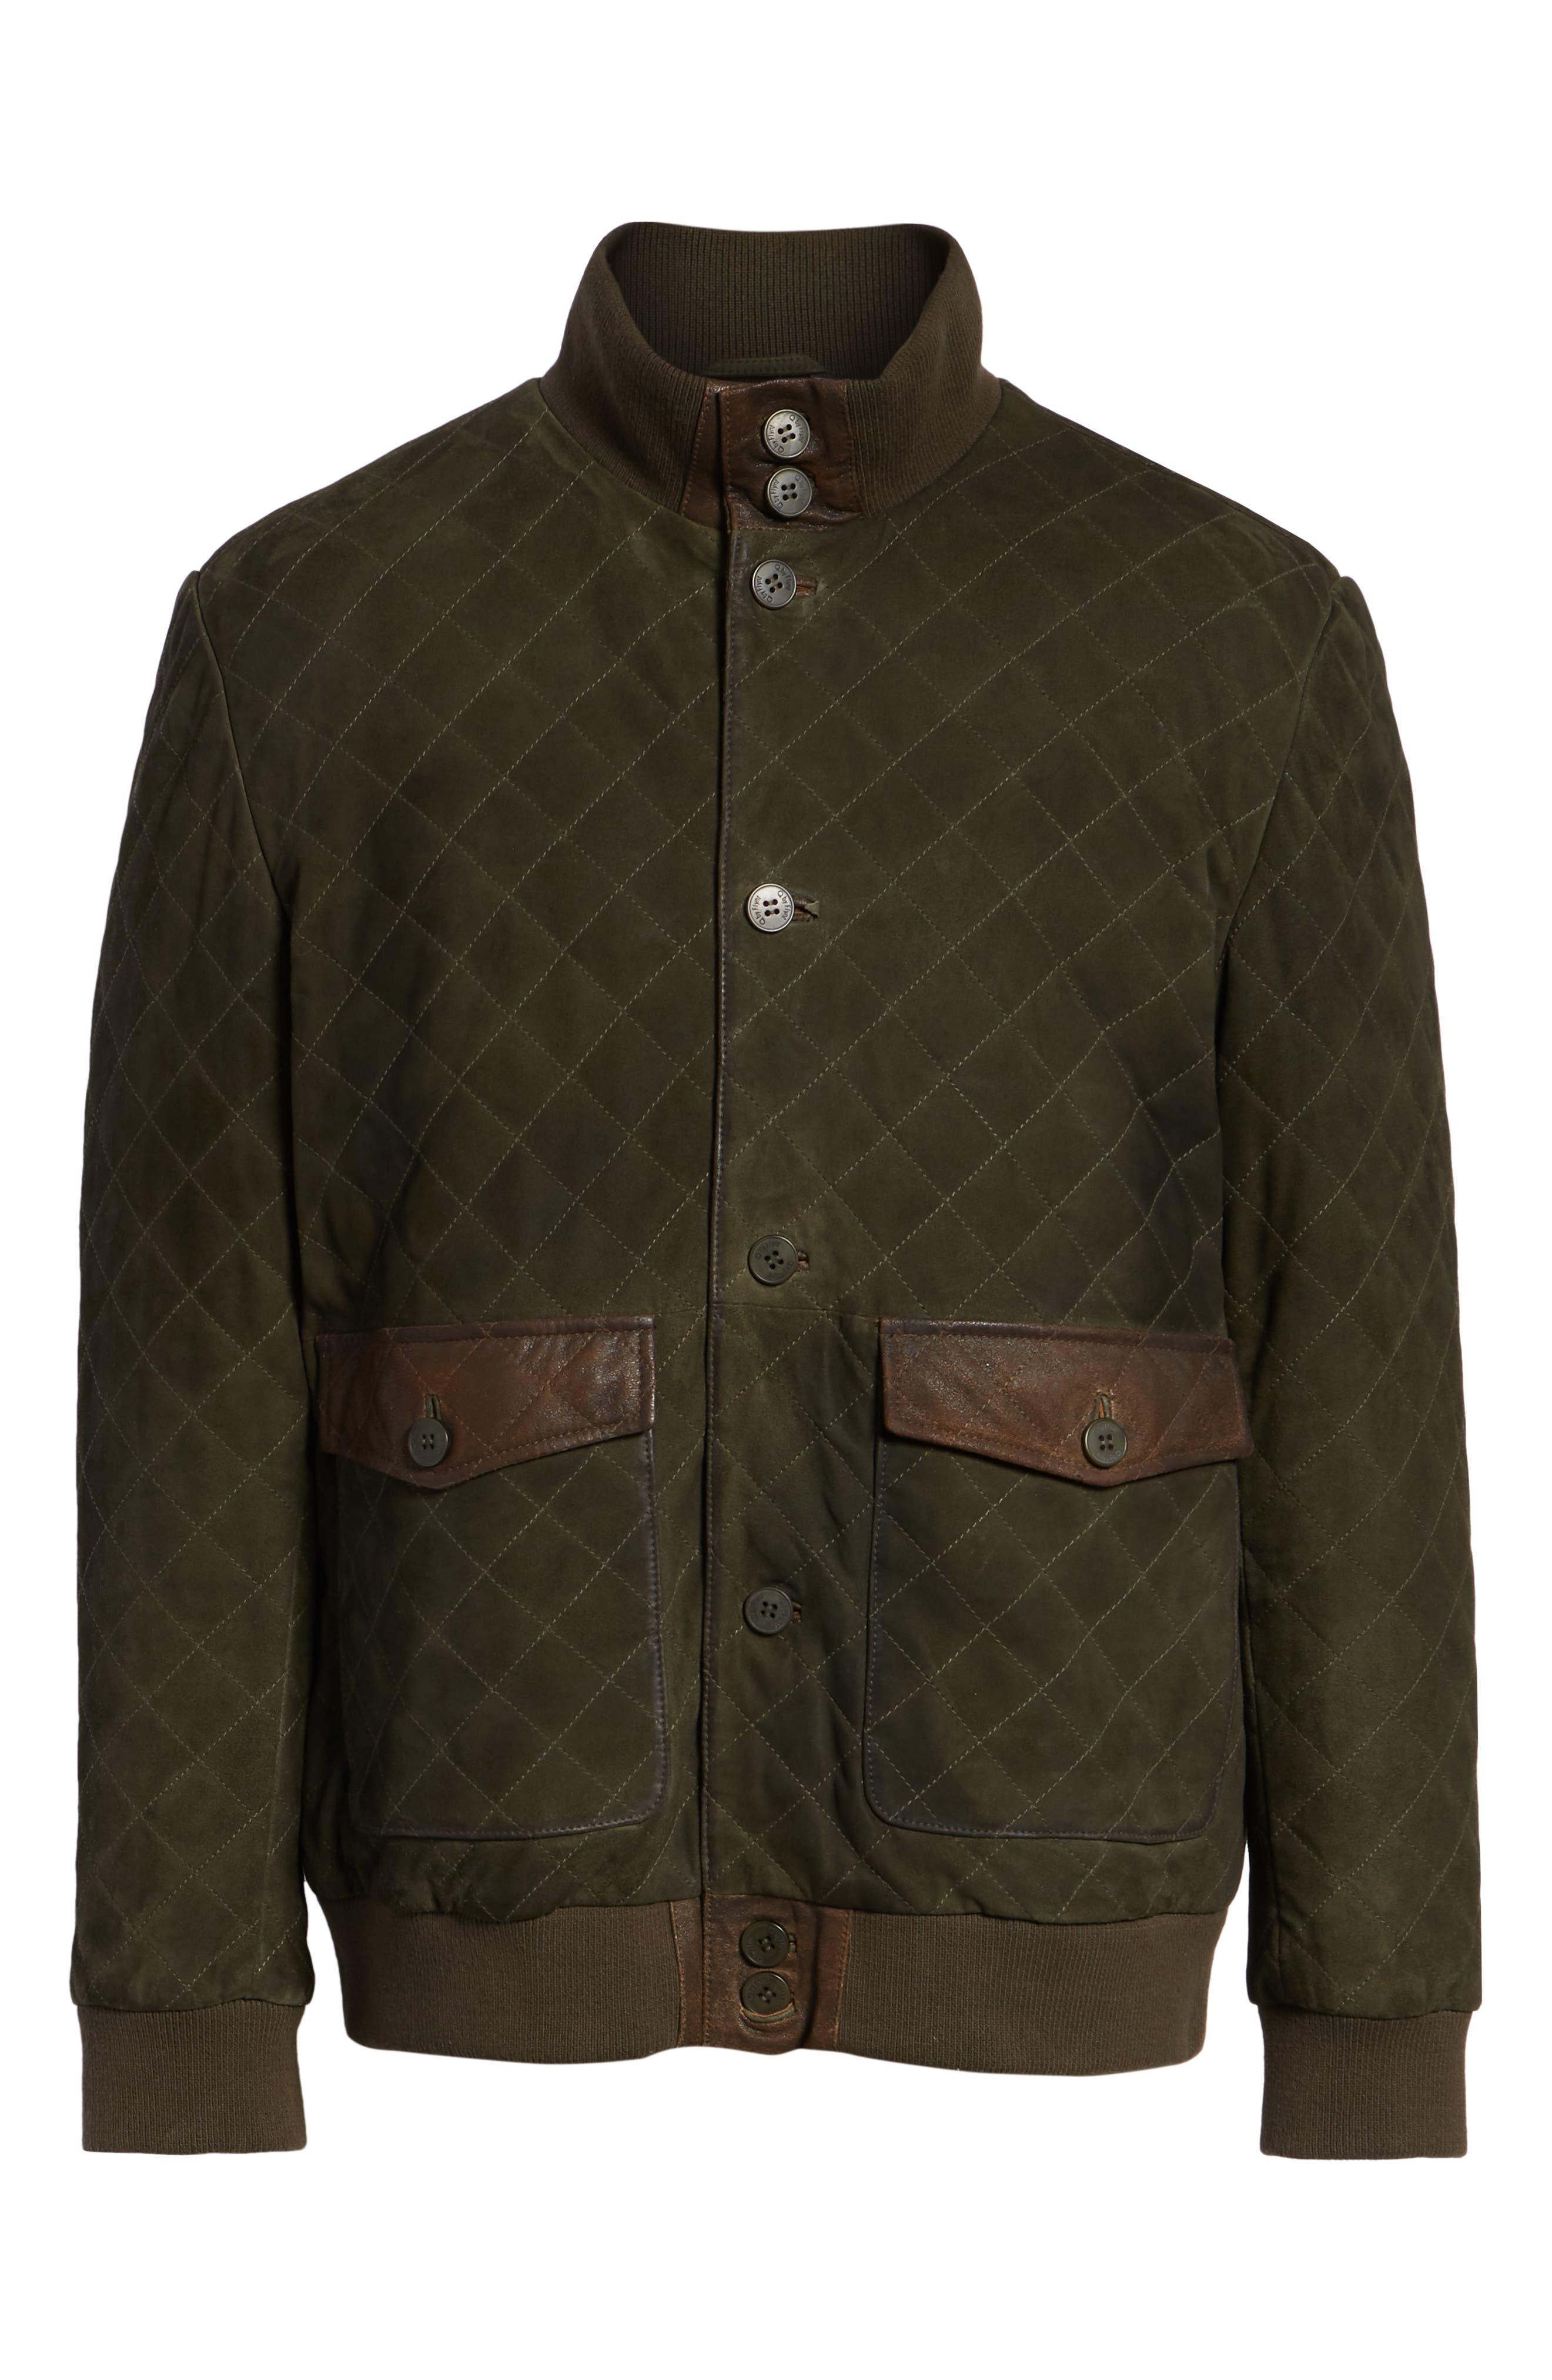 Regular Fit Quilted Suede Jacket,                             Alternate thumbnail 5, color,                             OLIVE